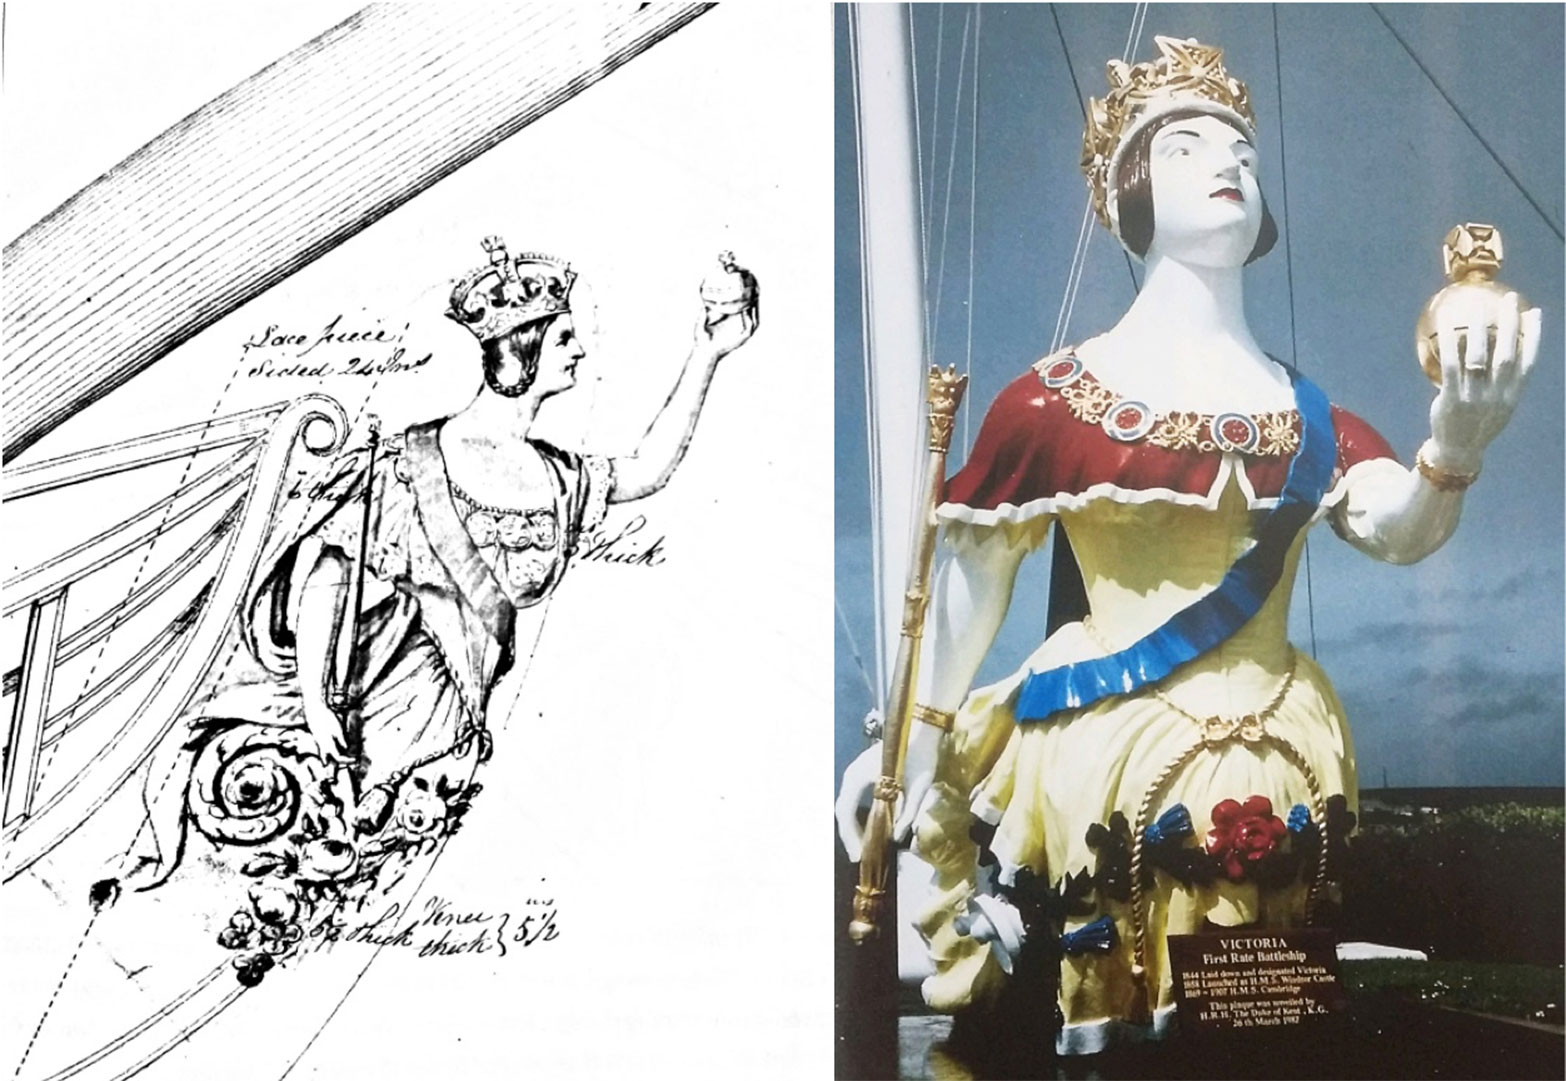 Figurehead from Royal Navy Ship HMS Windsor Castle